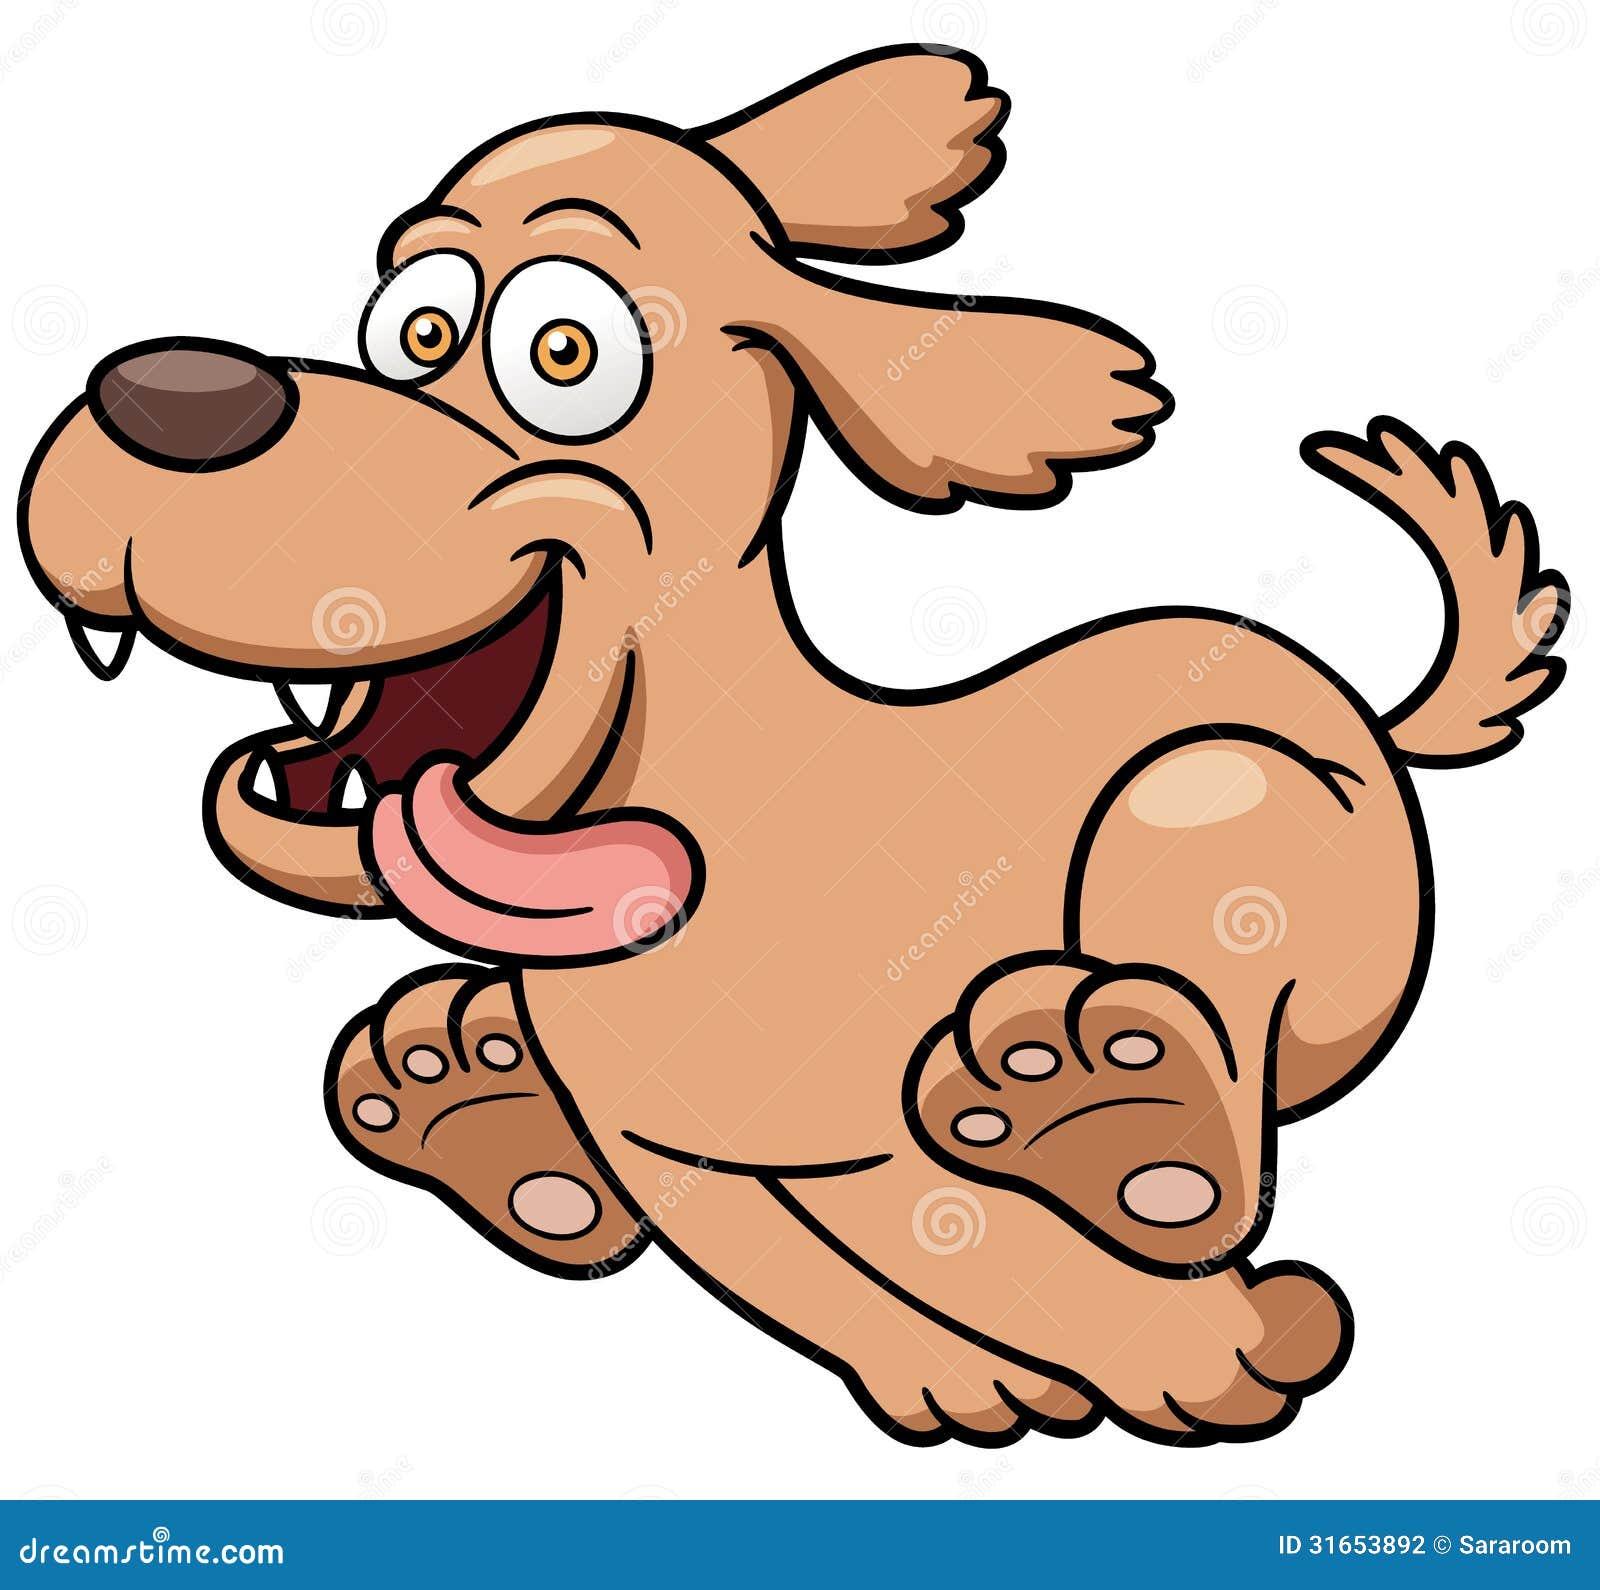 cartoon dog running stock vector illustration of furry 31653892 rh dreamstime com clip art of dogs running in 18th century clipart dogs running silhouette